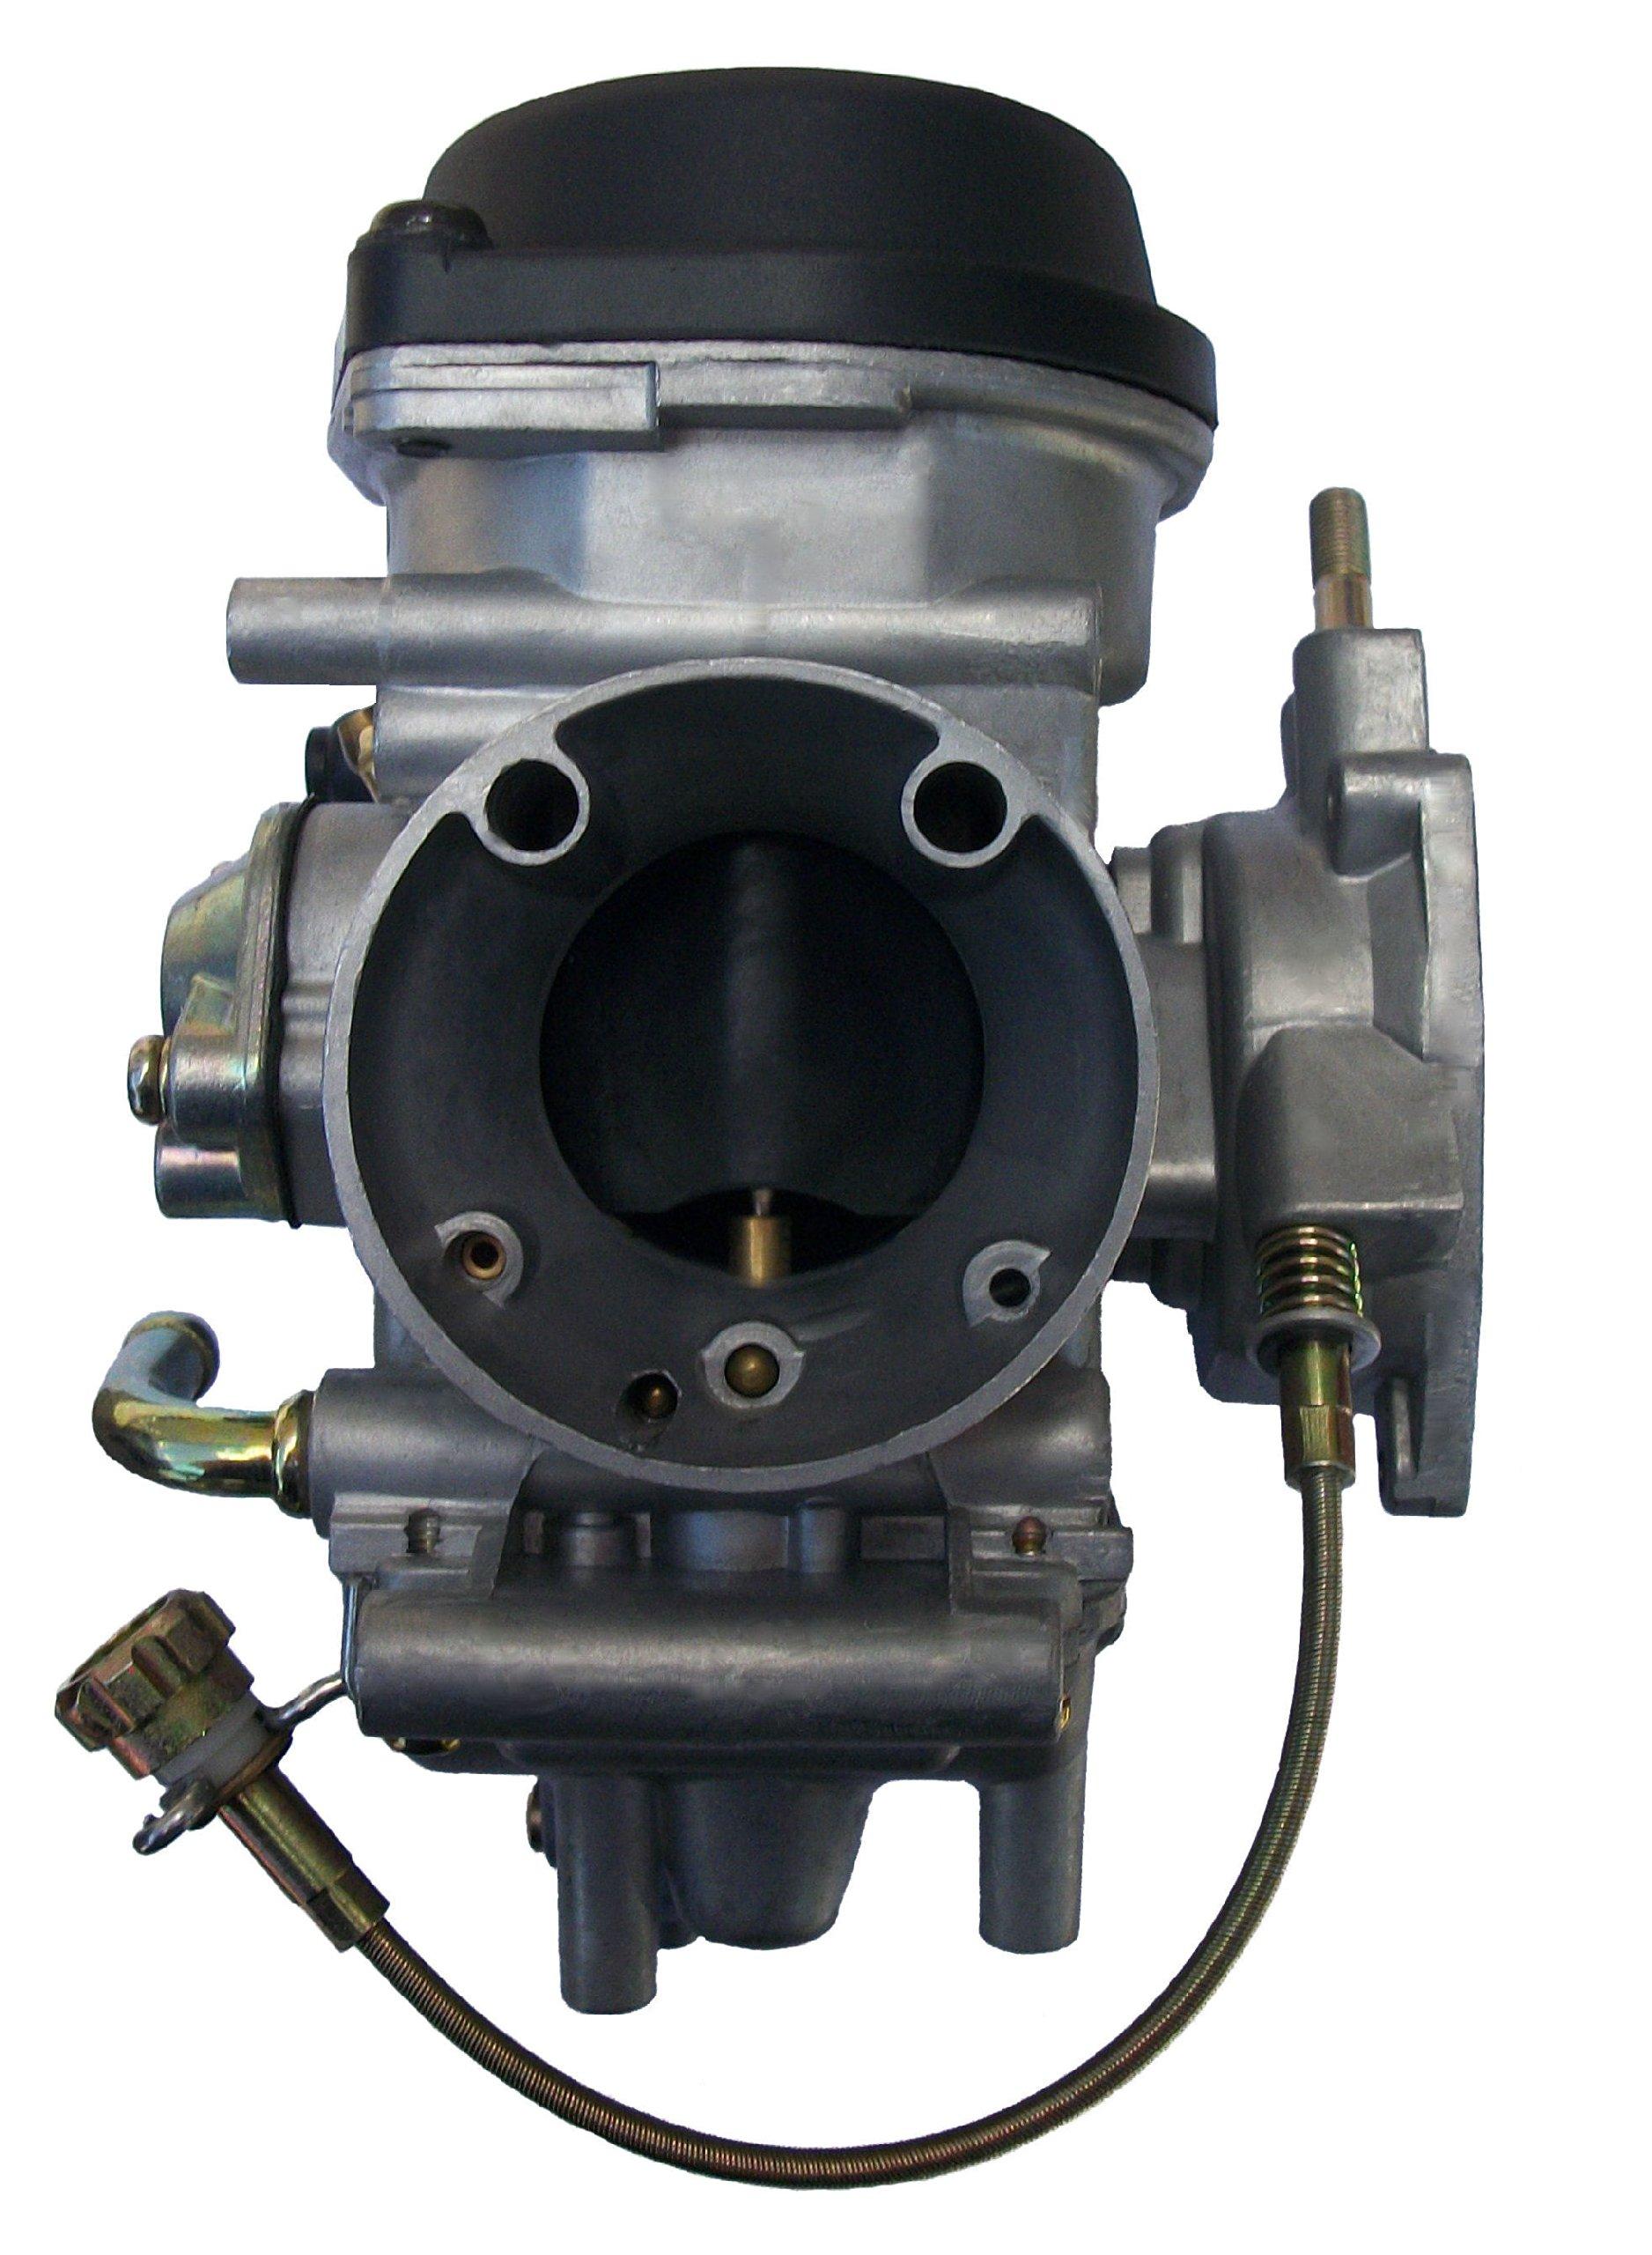 2002 Arctic Cat ZR 500 CC//500 LE Snowmobile SPI Carburetor Adapter Flange